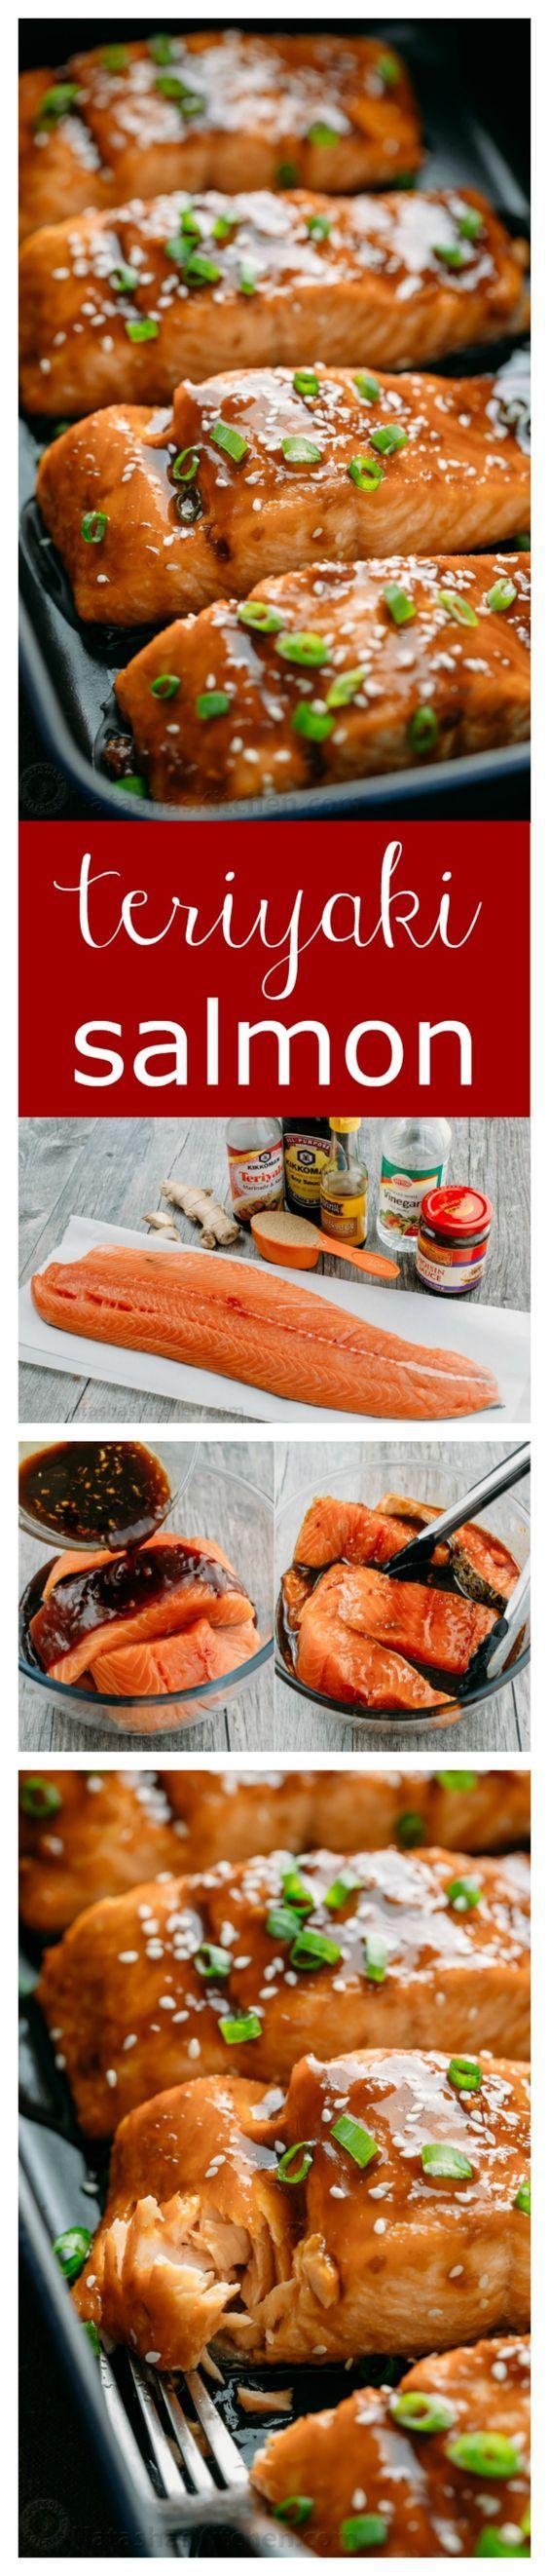 Teriyaki salmon, Salmon recipes and Salmon on Pinterest